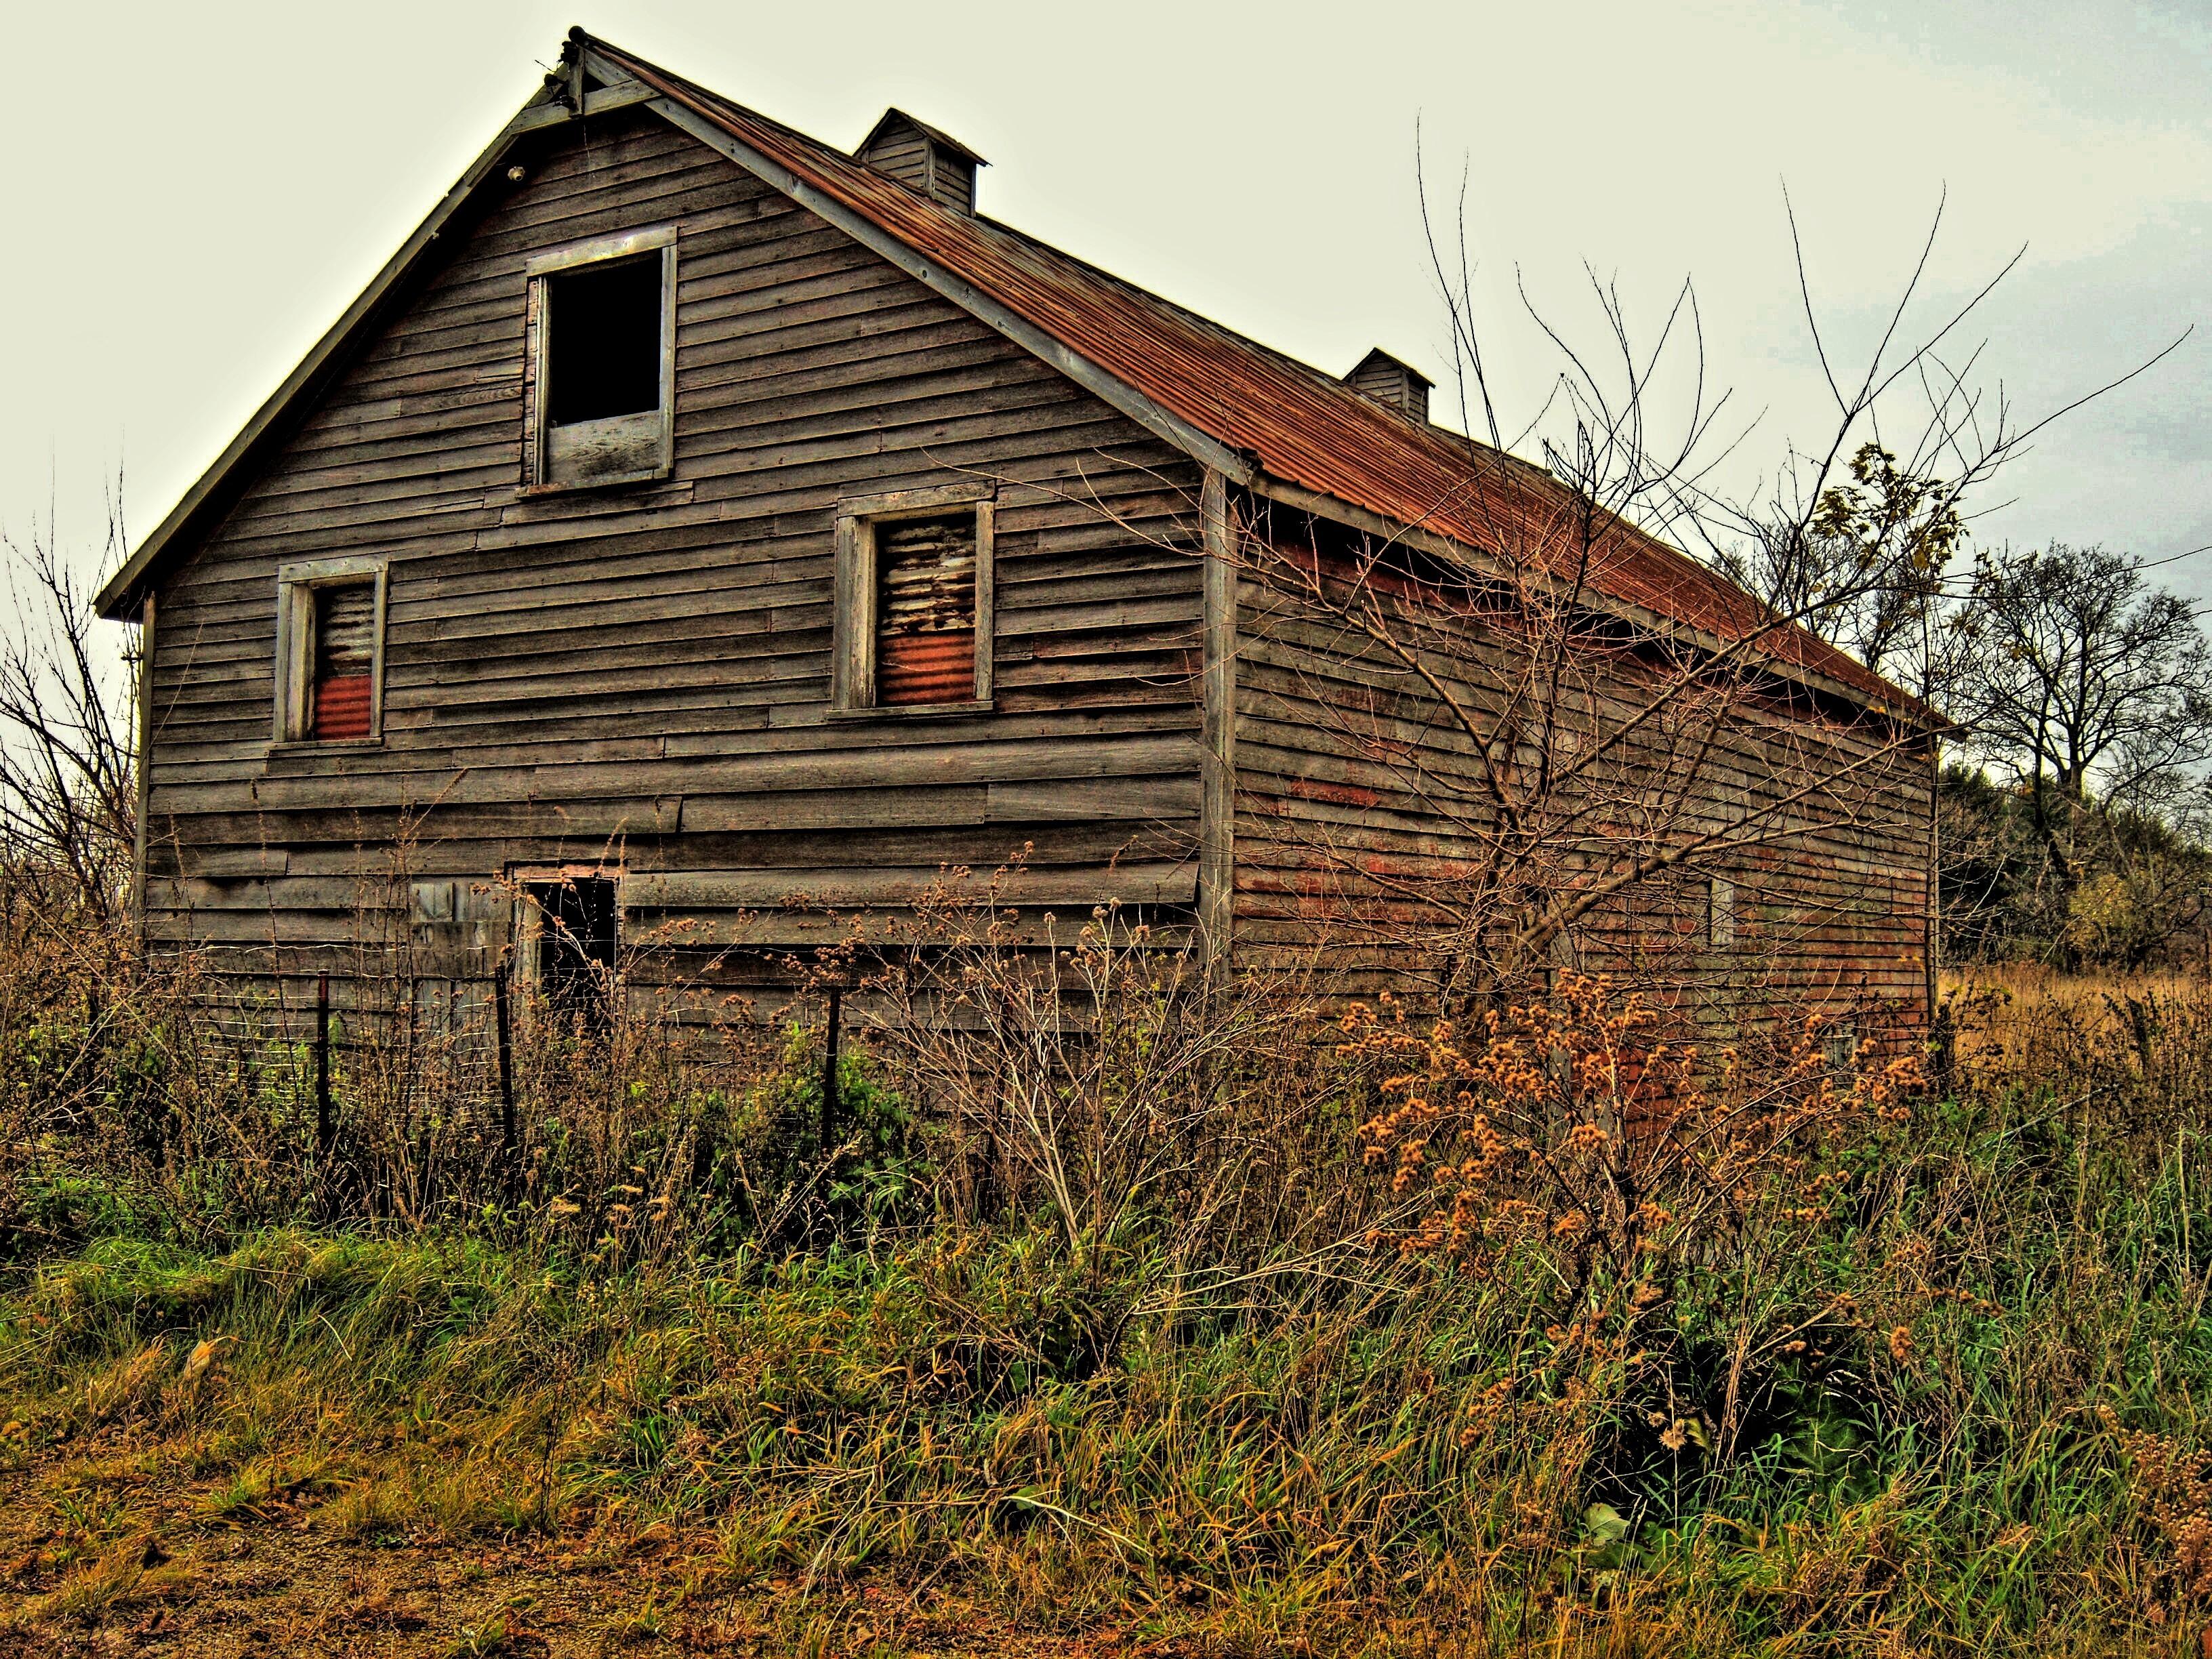 Fotos gratis : árbol, granja, pradera, edificio, granero, choza ...